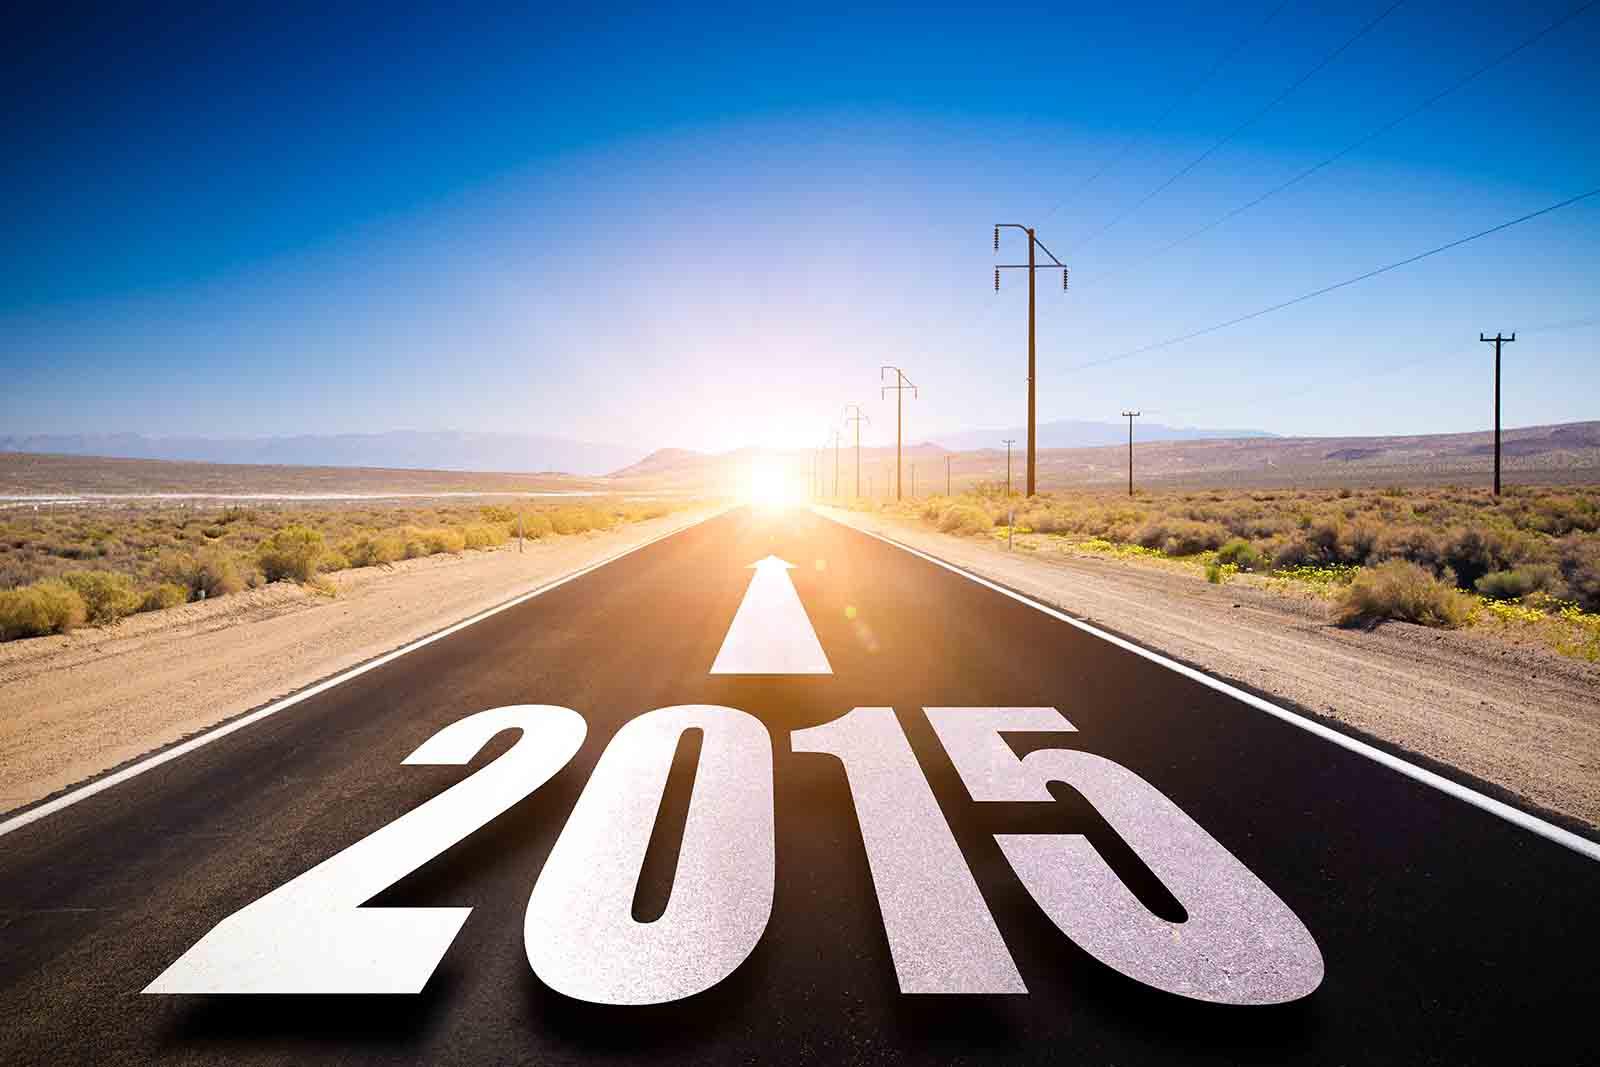 Happy New Year 2015 : 無料素材 年賀状 2015 : 年賀状